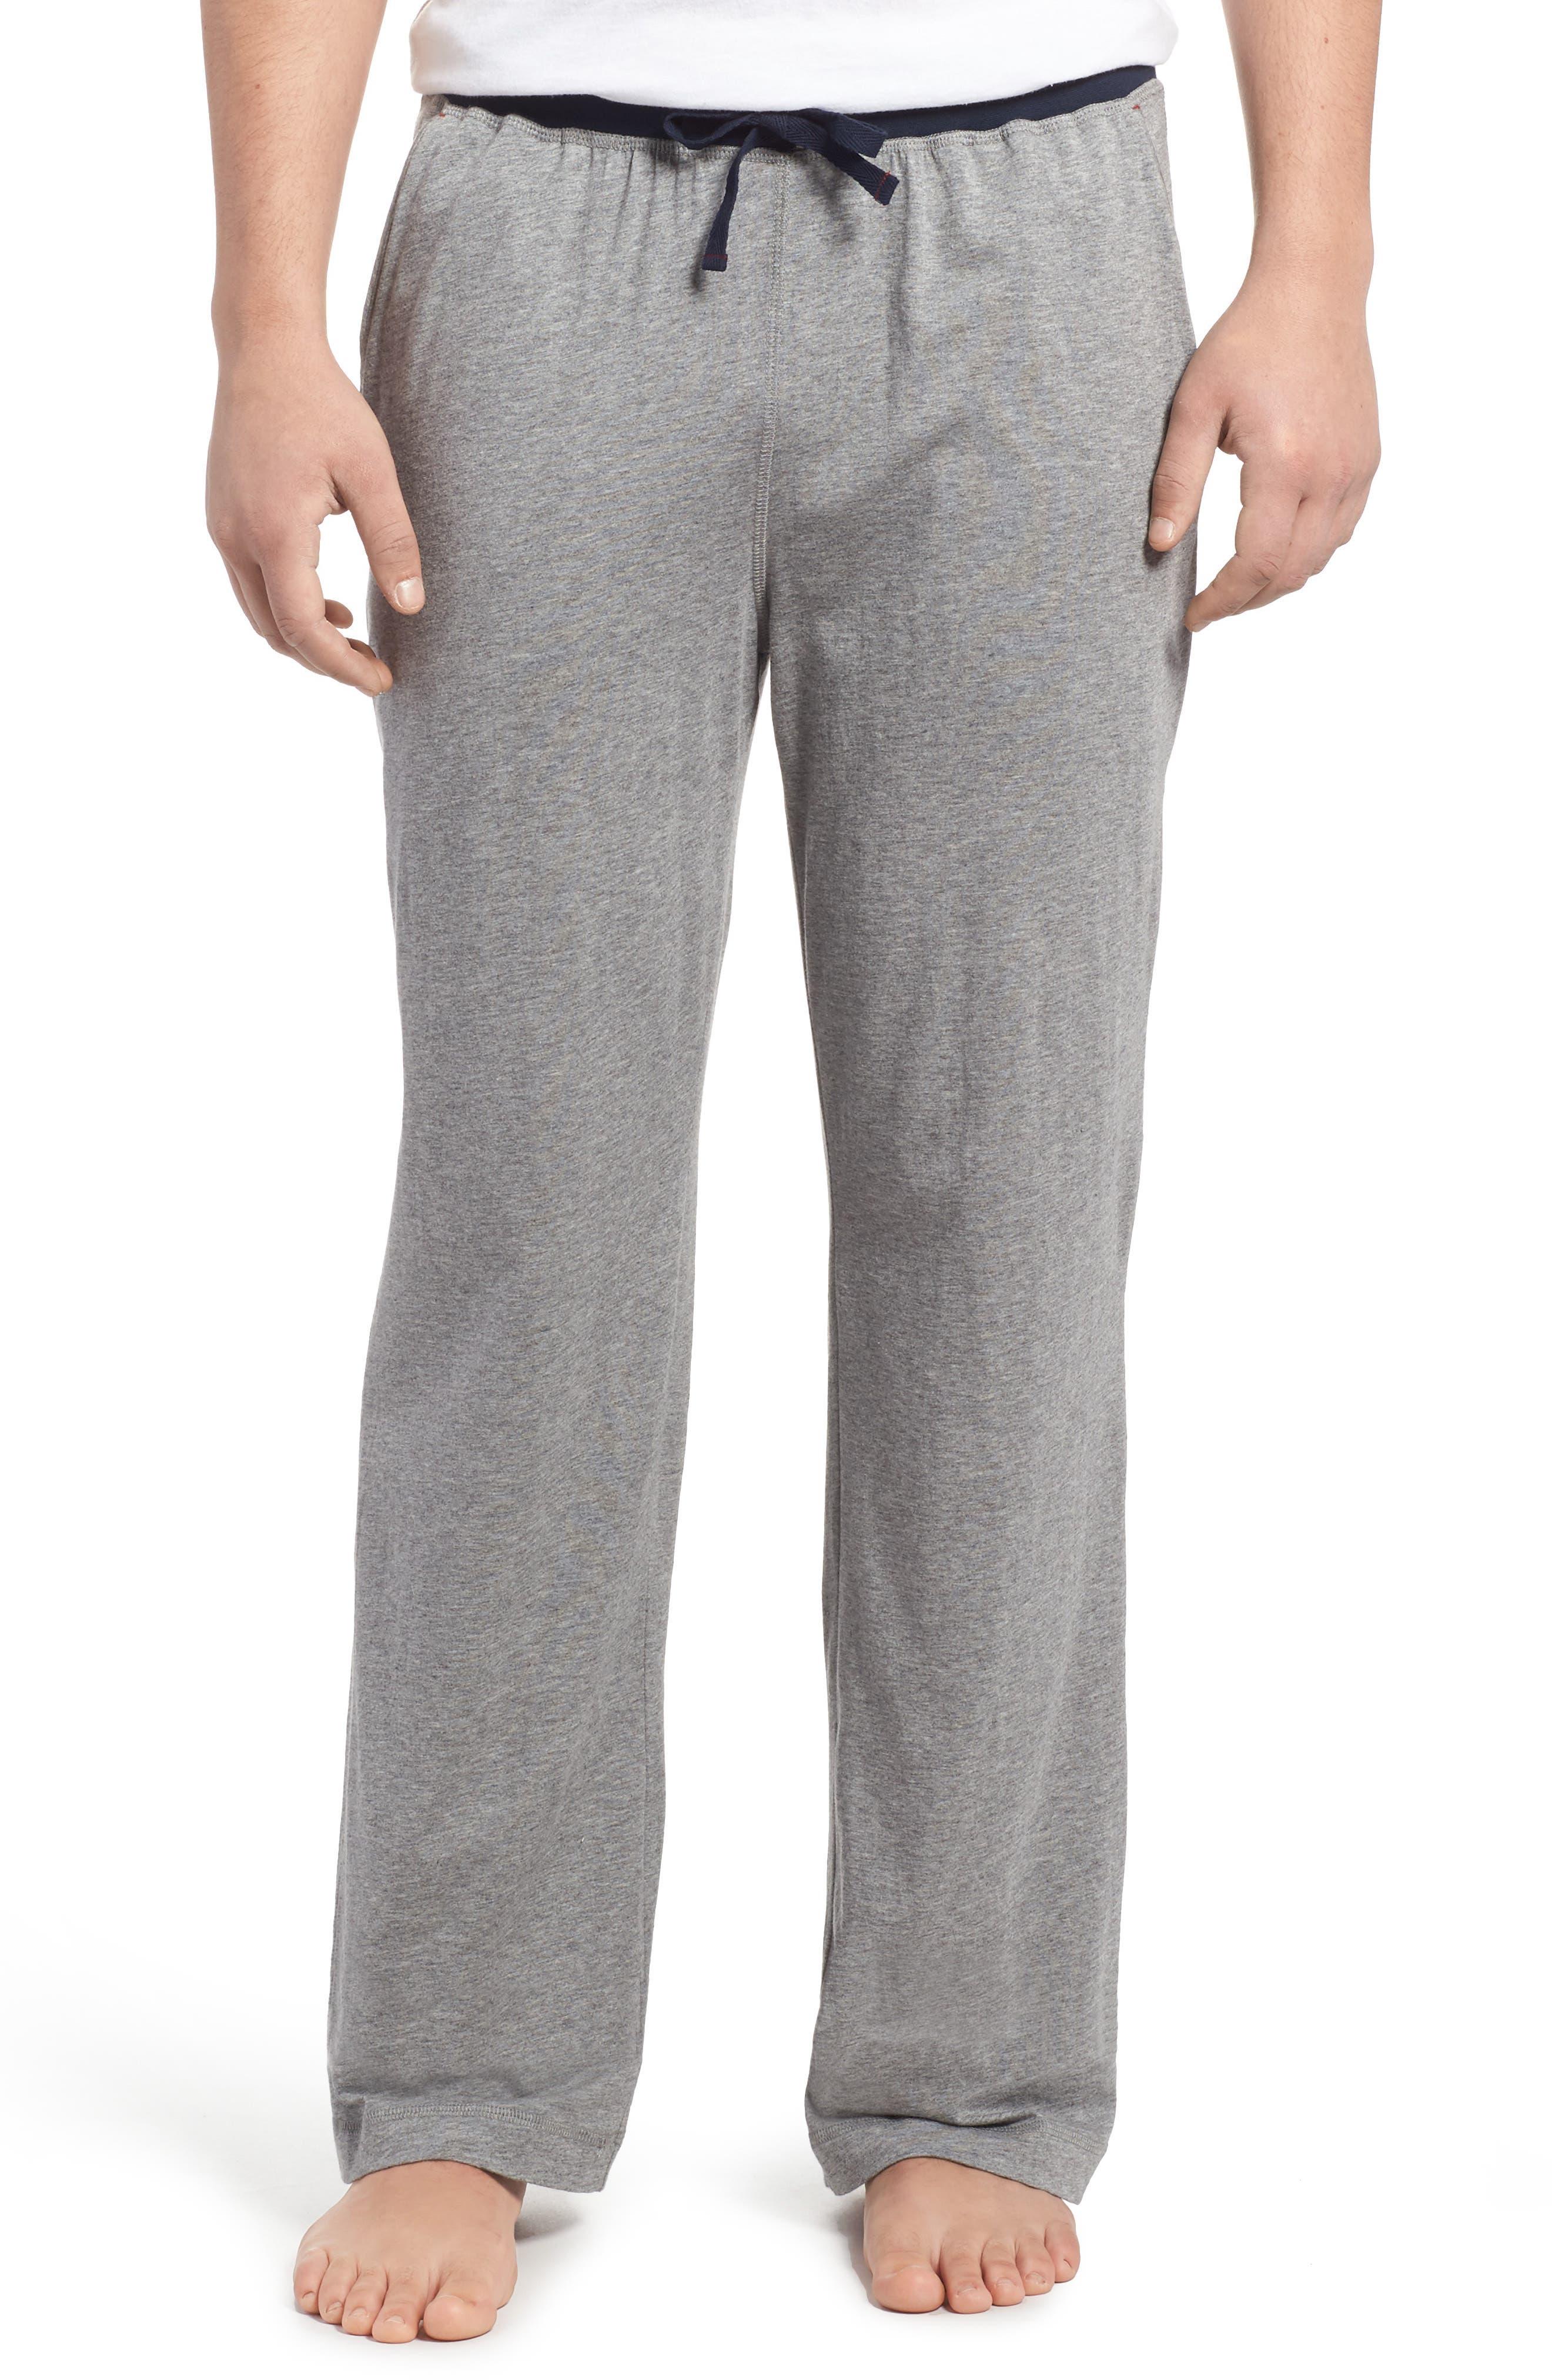 Pima Cotton & Modal Lounge Pants,                         Main,                         color, Grey Heather